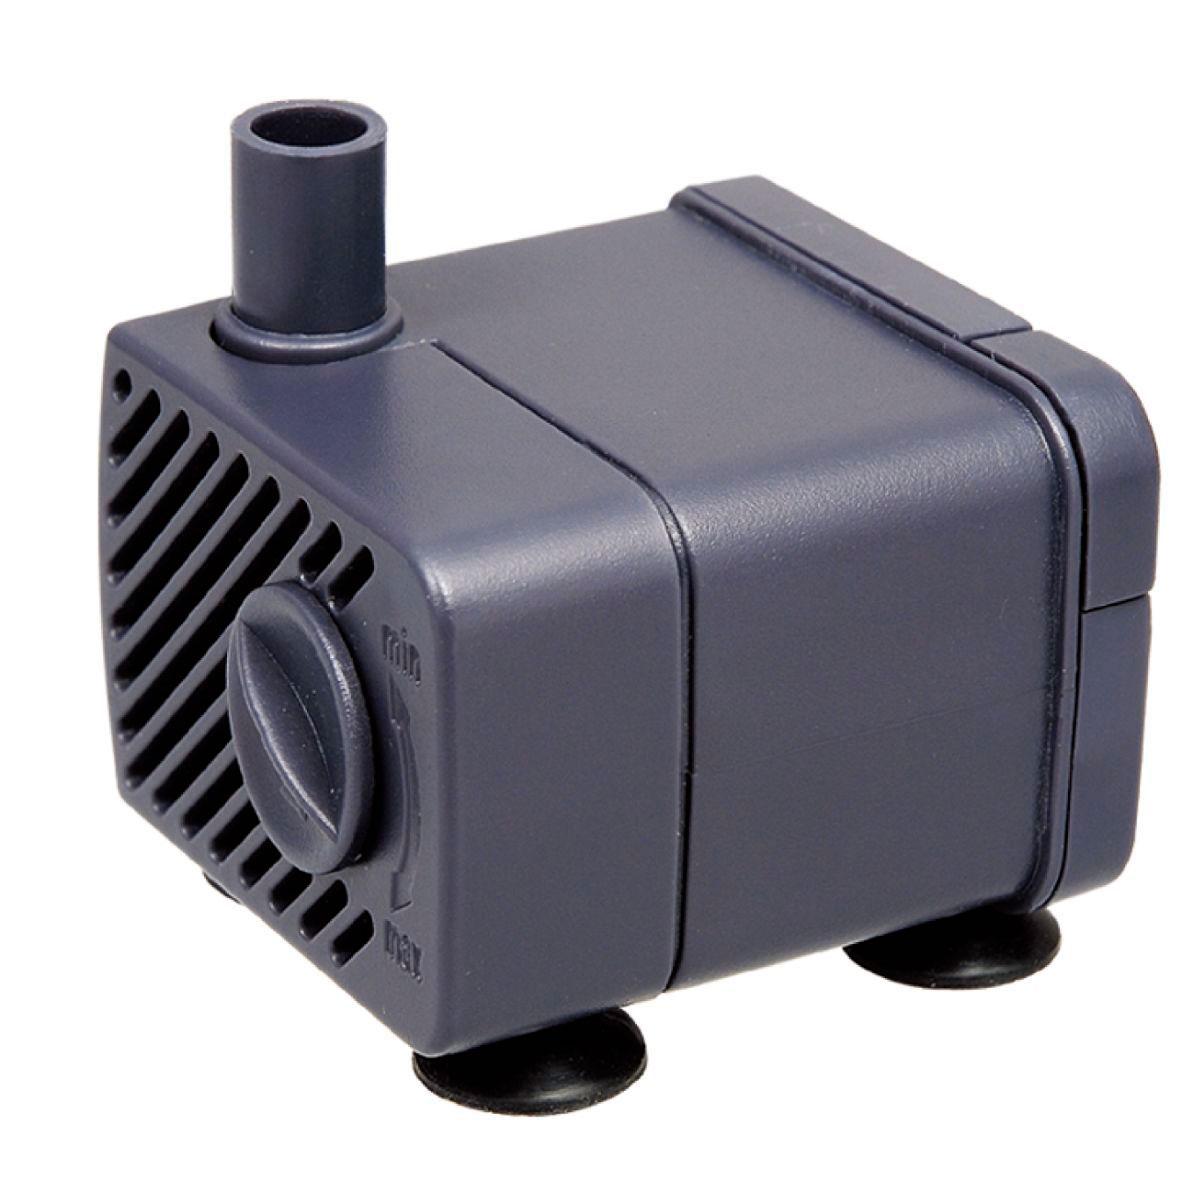 Помпа фонтанная Barbus Pump 012 300 л/ч 5 Вт (1 шт) водяная помпа aleas 220 л ч